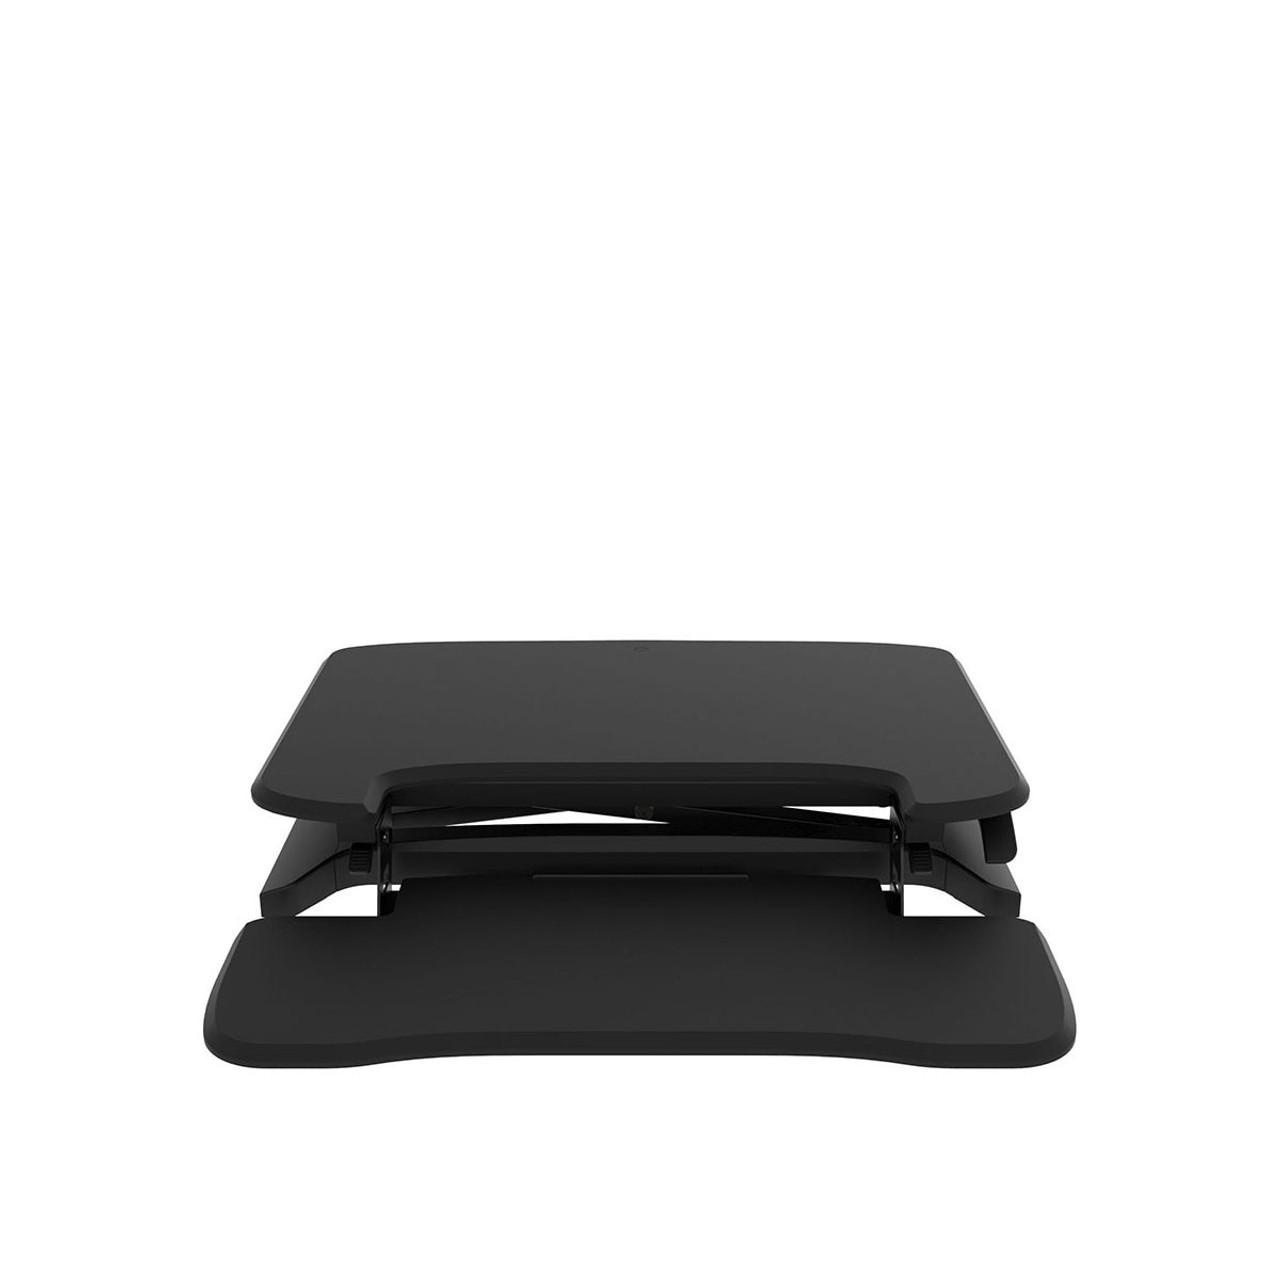 EFurnit Standing Desk Riser/Converter - Convert your Desk to a Height Adjustable Sit Stand Workstation- Series 151-Black